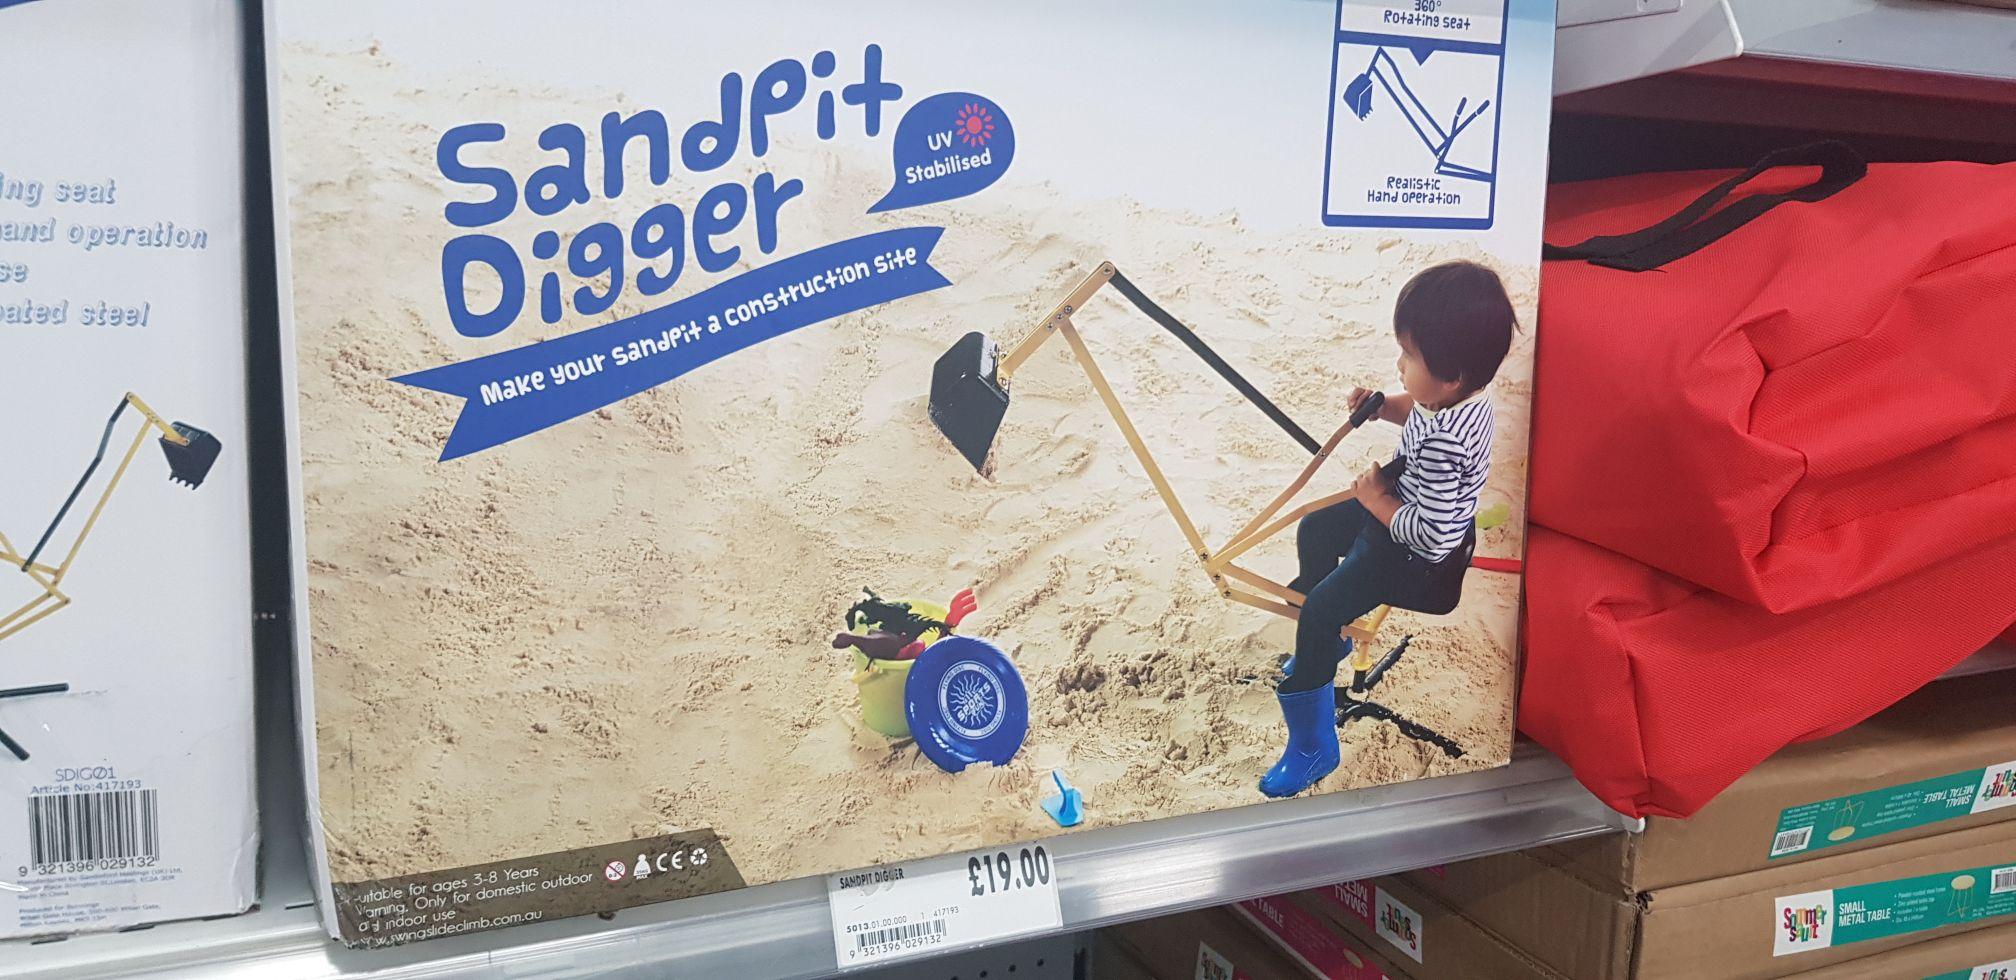 Sand pit mini digger £19 homebase